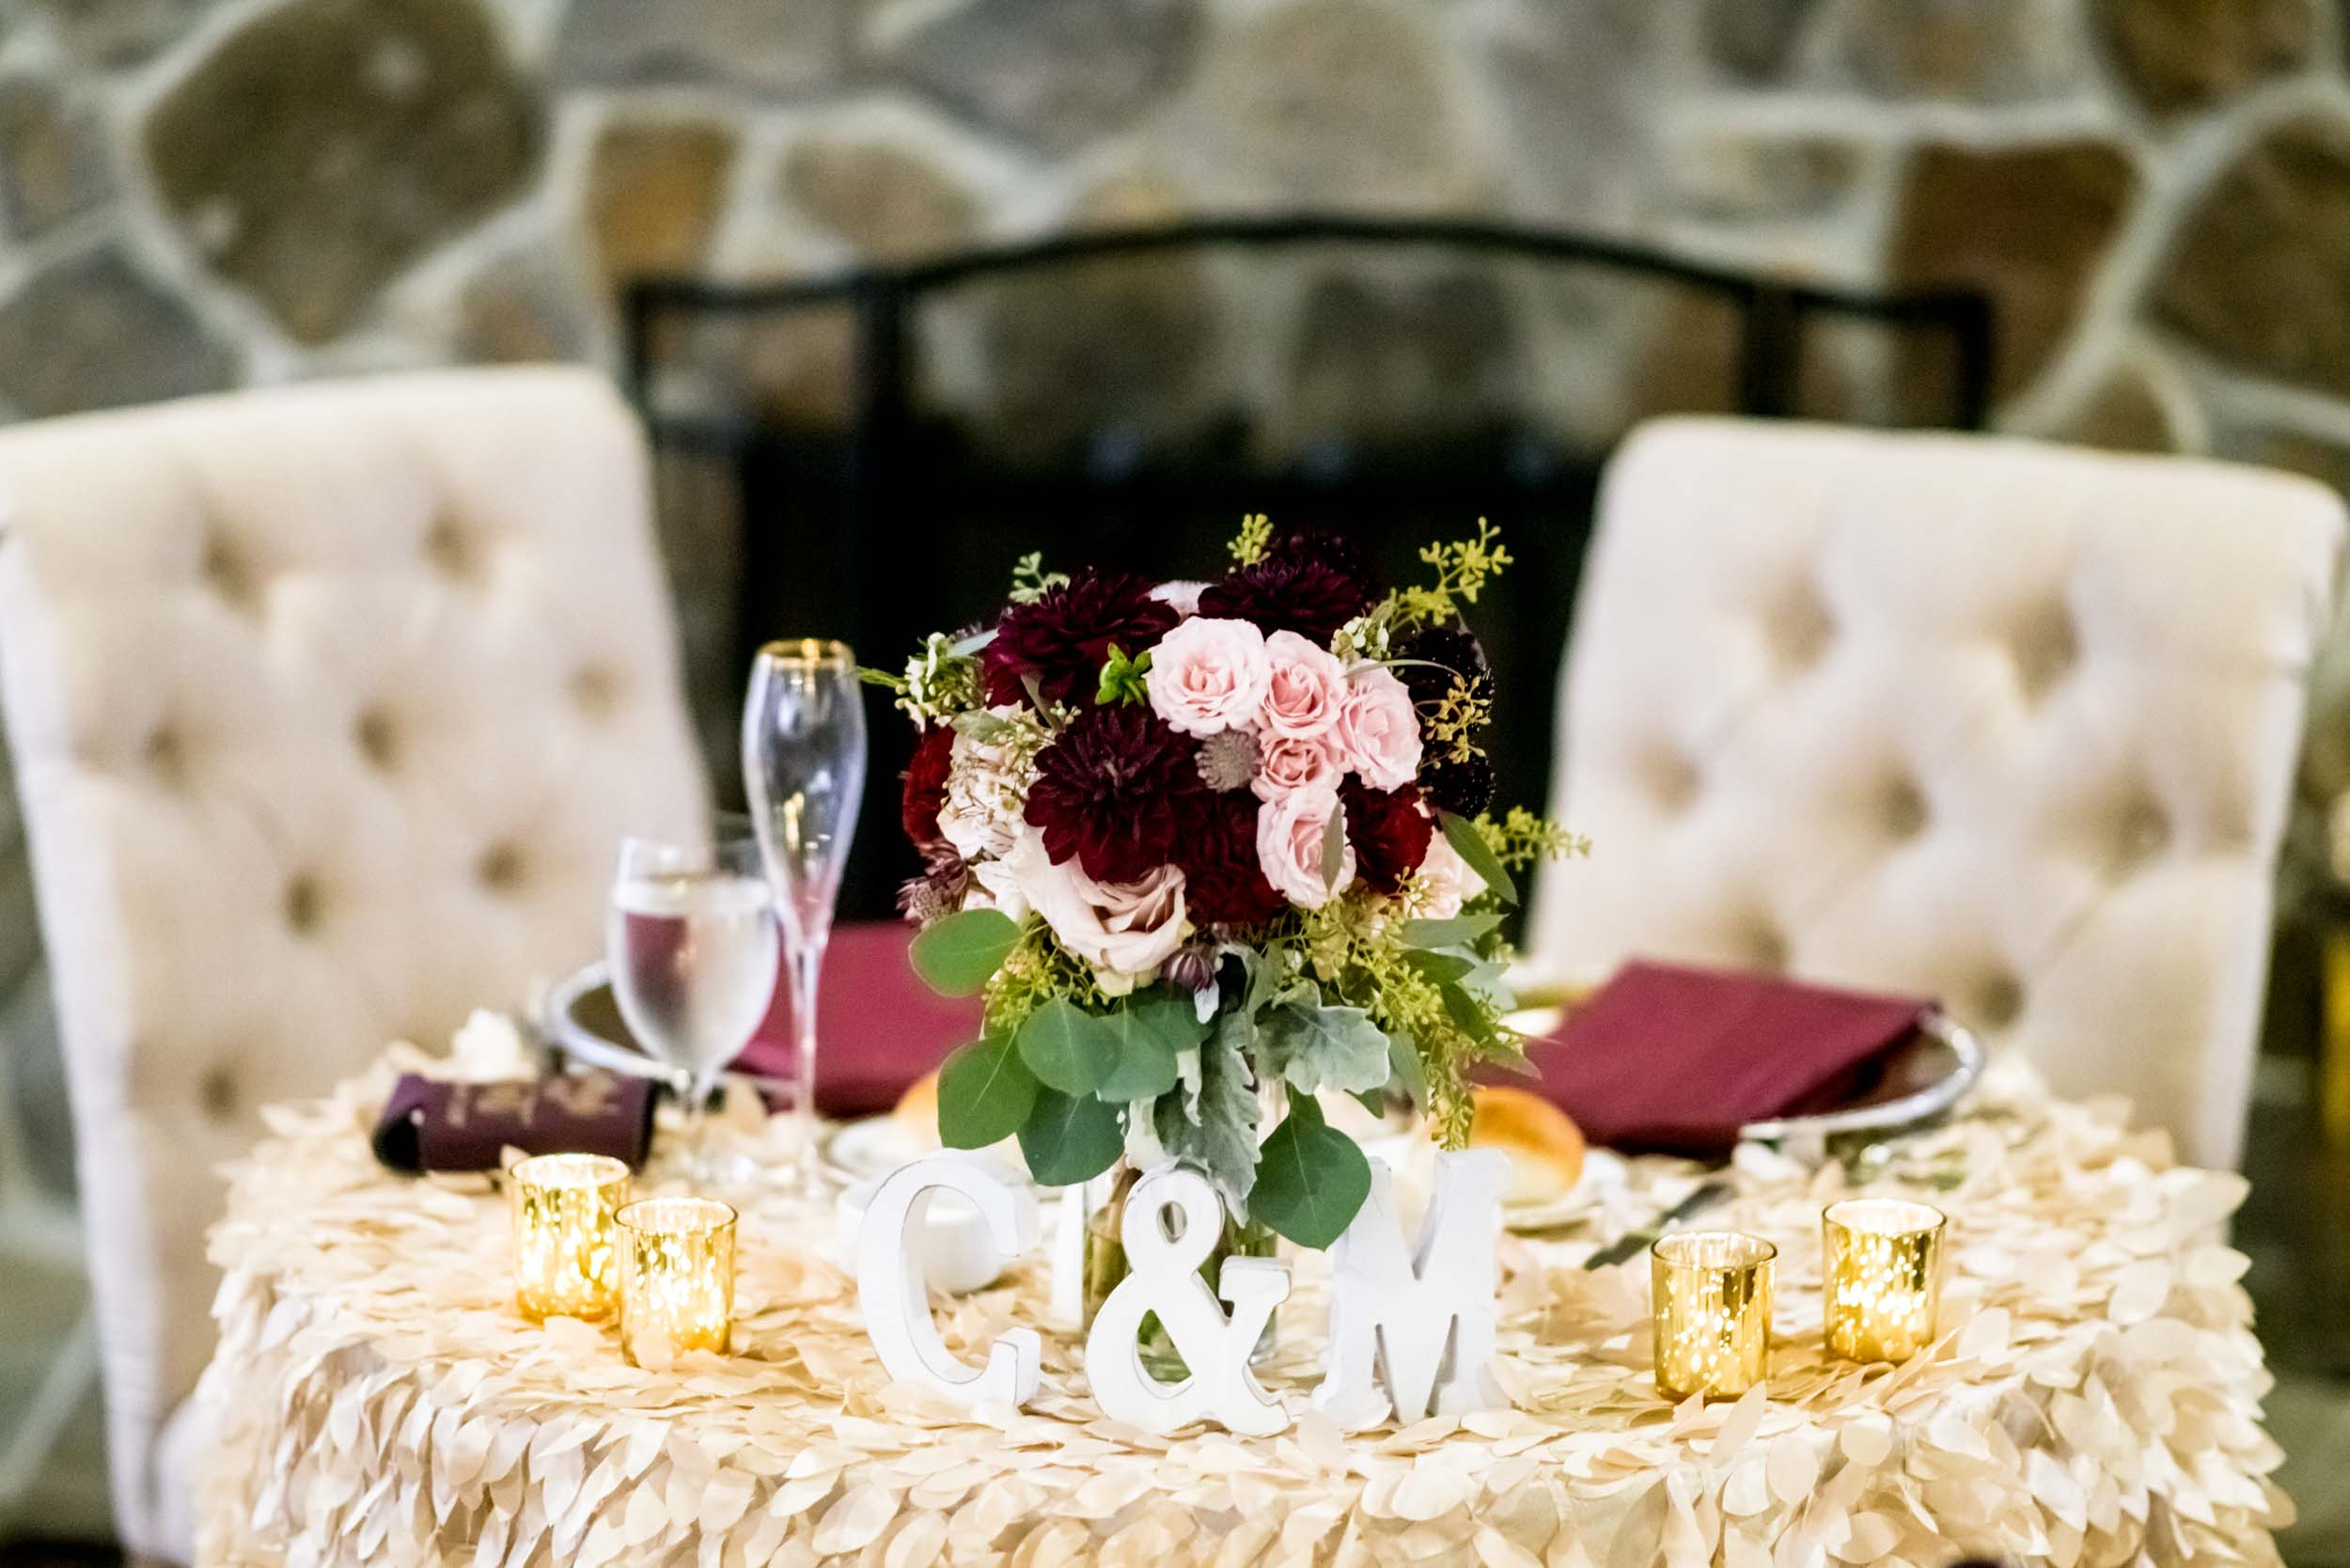 dc+metro+wedding+photographer+vadym+guliuk+photography+wedding+decorations-2031.jpg